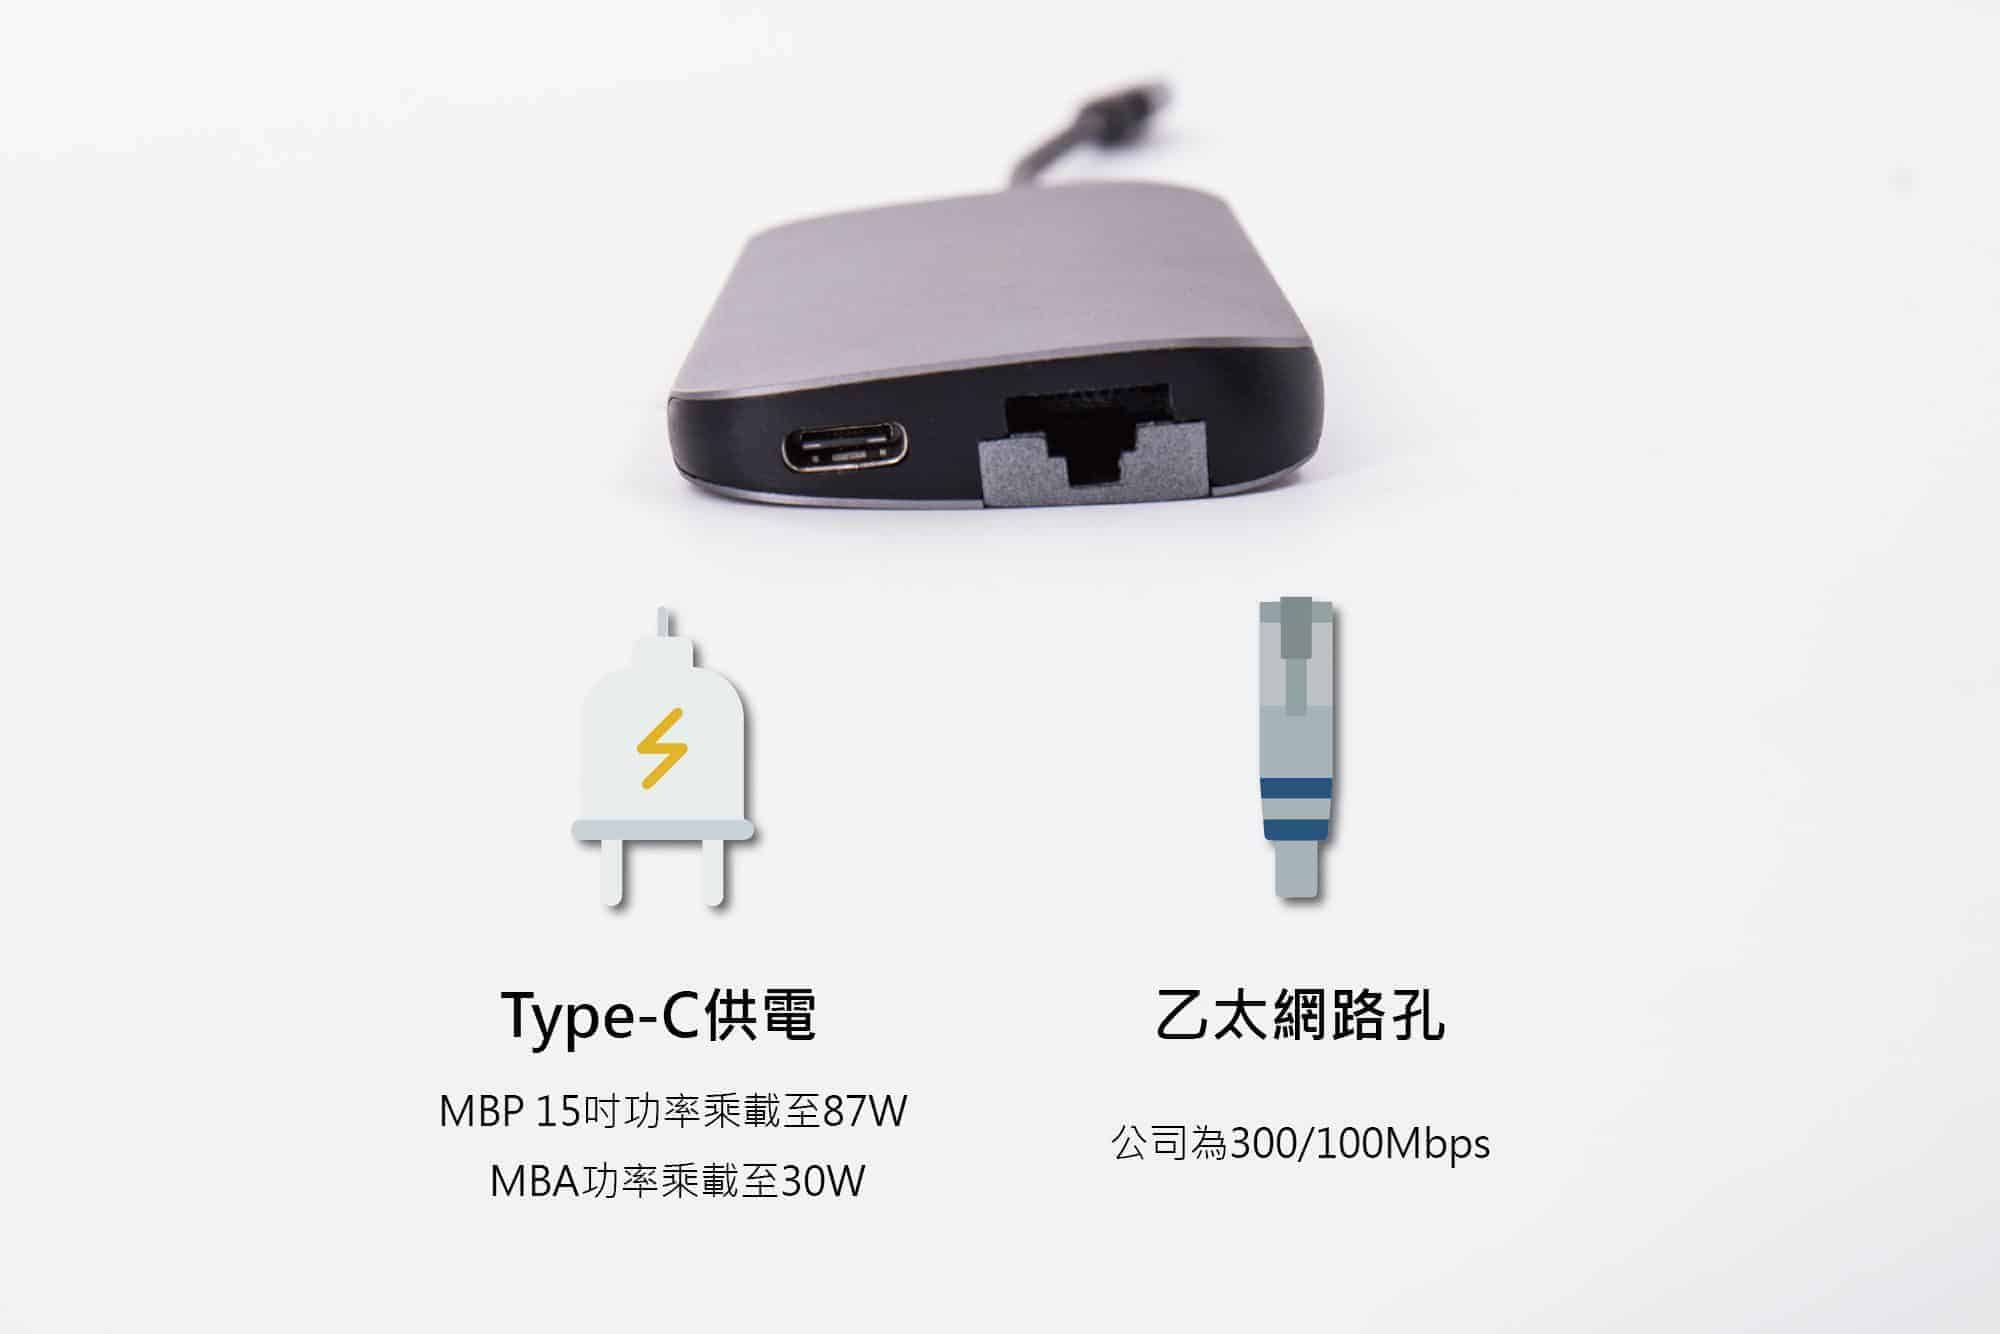 MacBook Hub 提供Type-C充電孔以及RJ45乙太網路孔